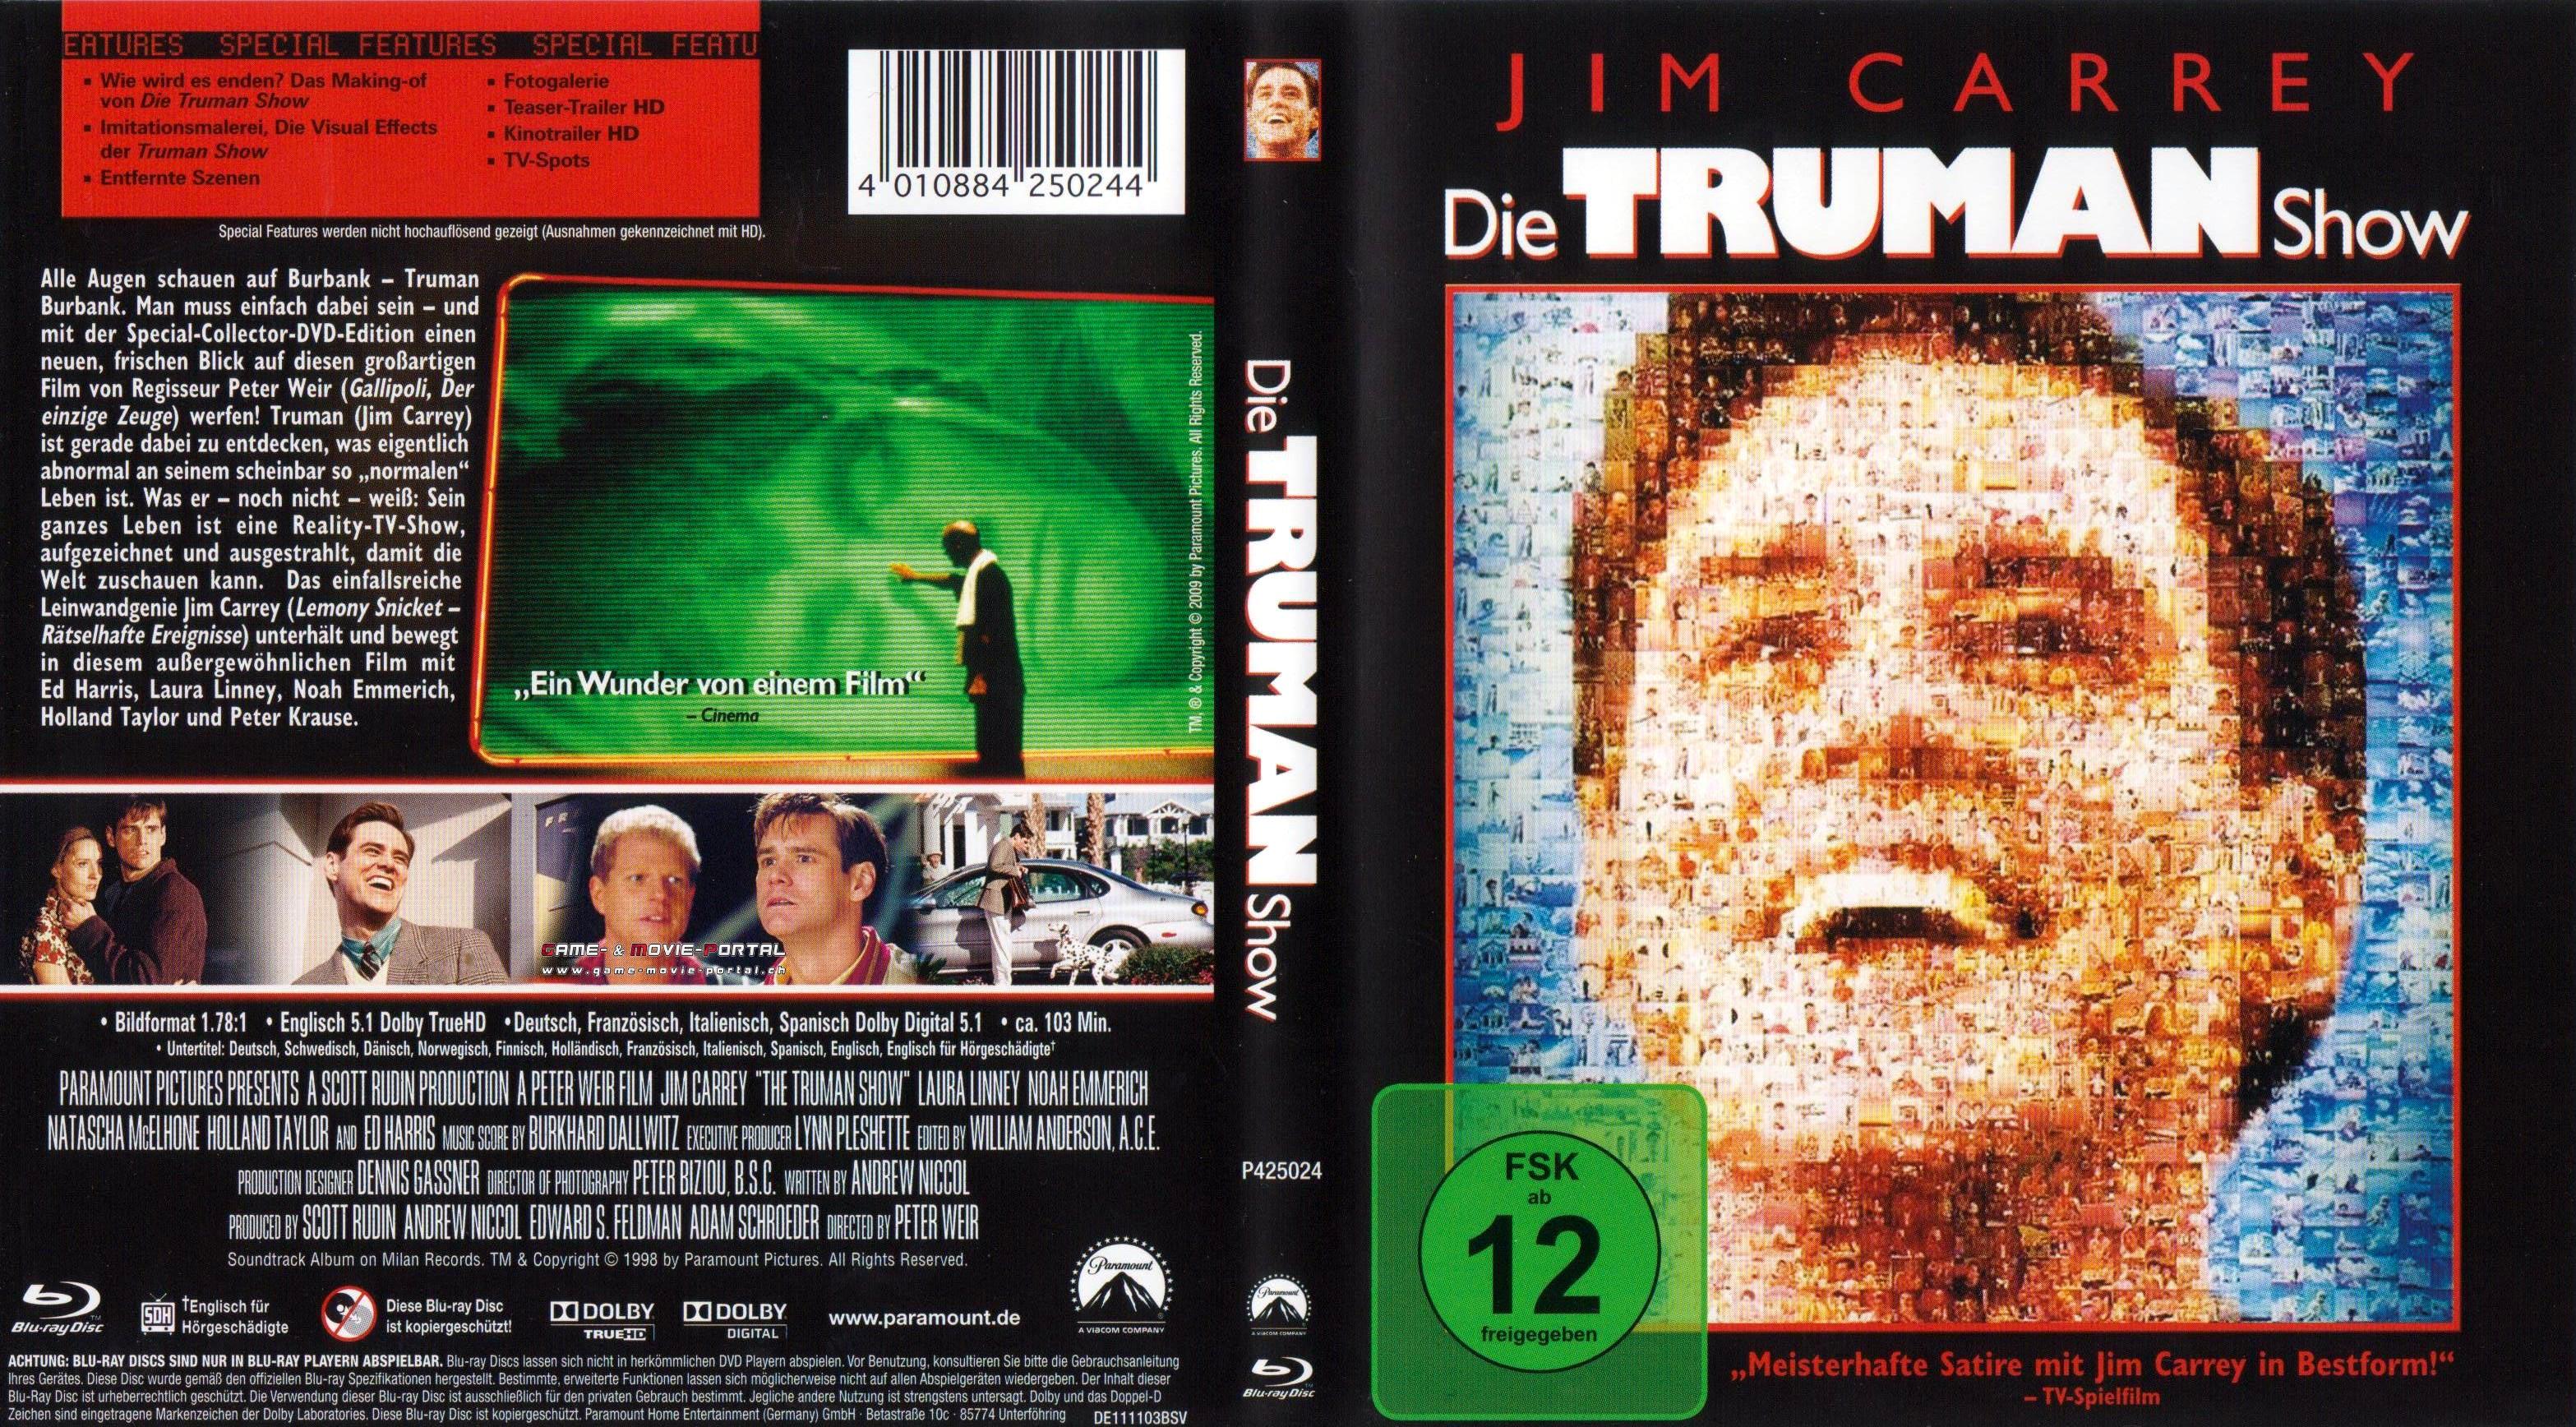 The Truman Show 1998 Hindi Dubbed  filmyzillaorg